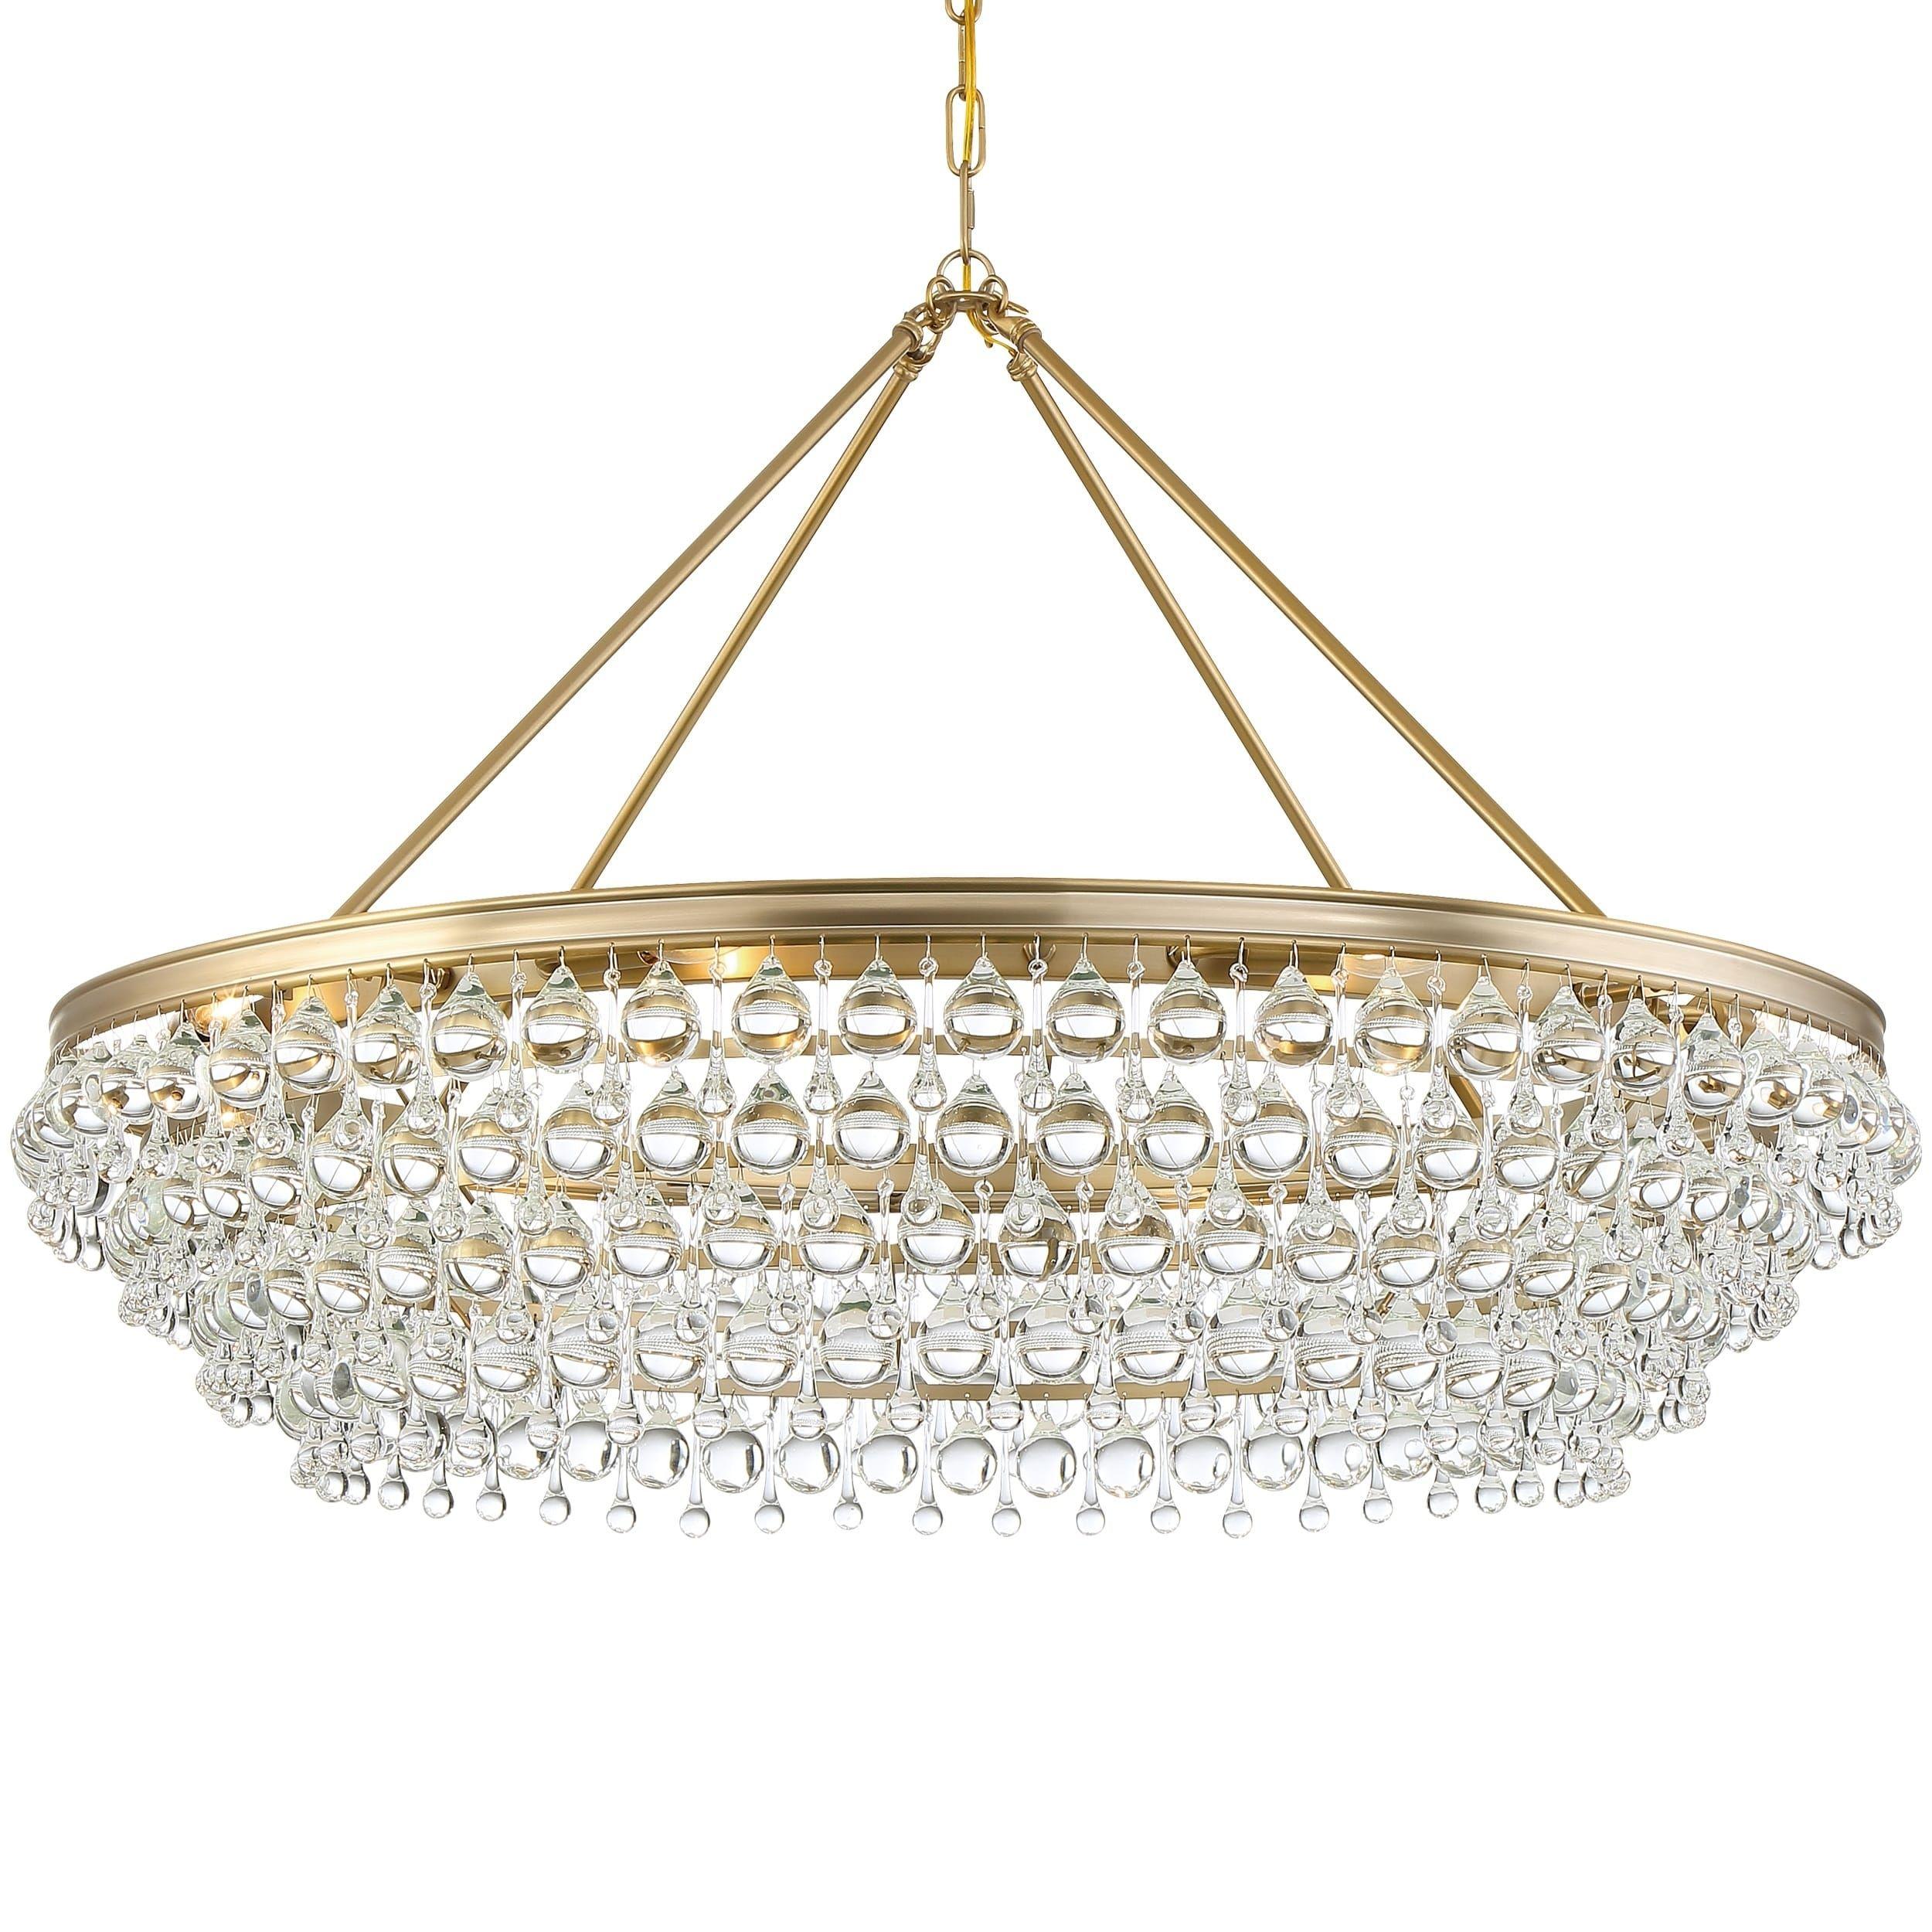 Ceiling Lighting Regarding Bramers 6 Light Novelty Chandeliers (View 19 of 30)